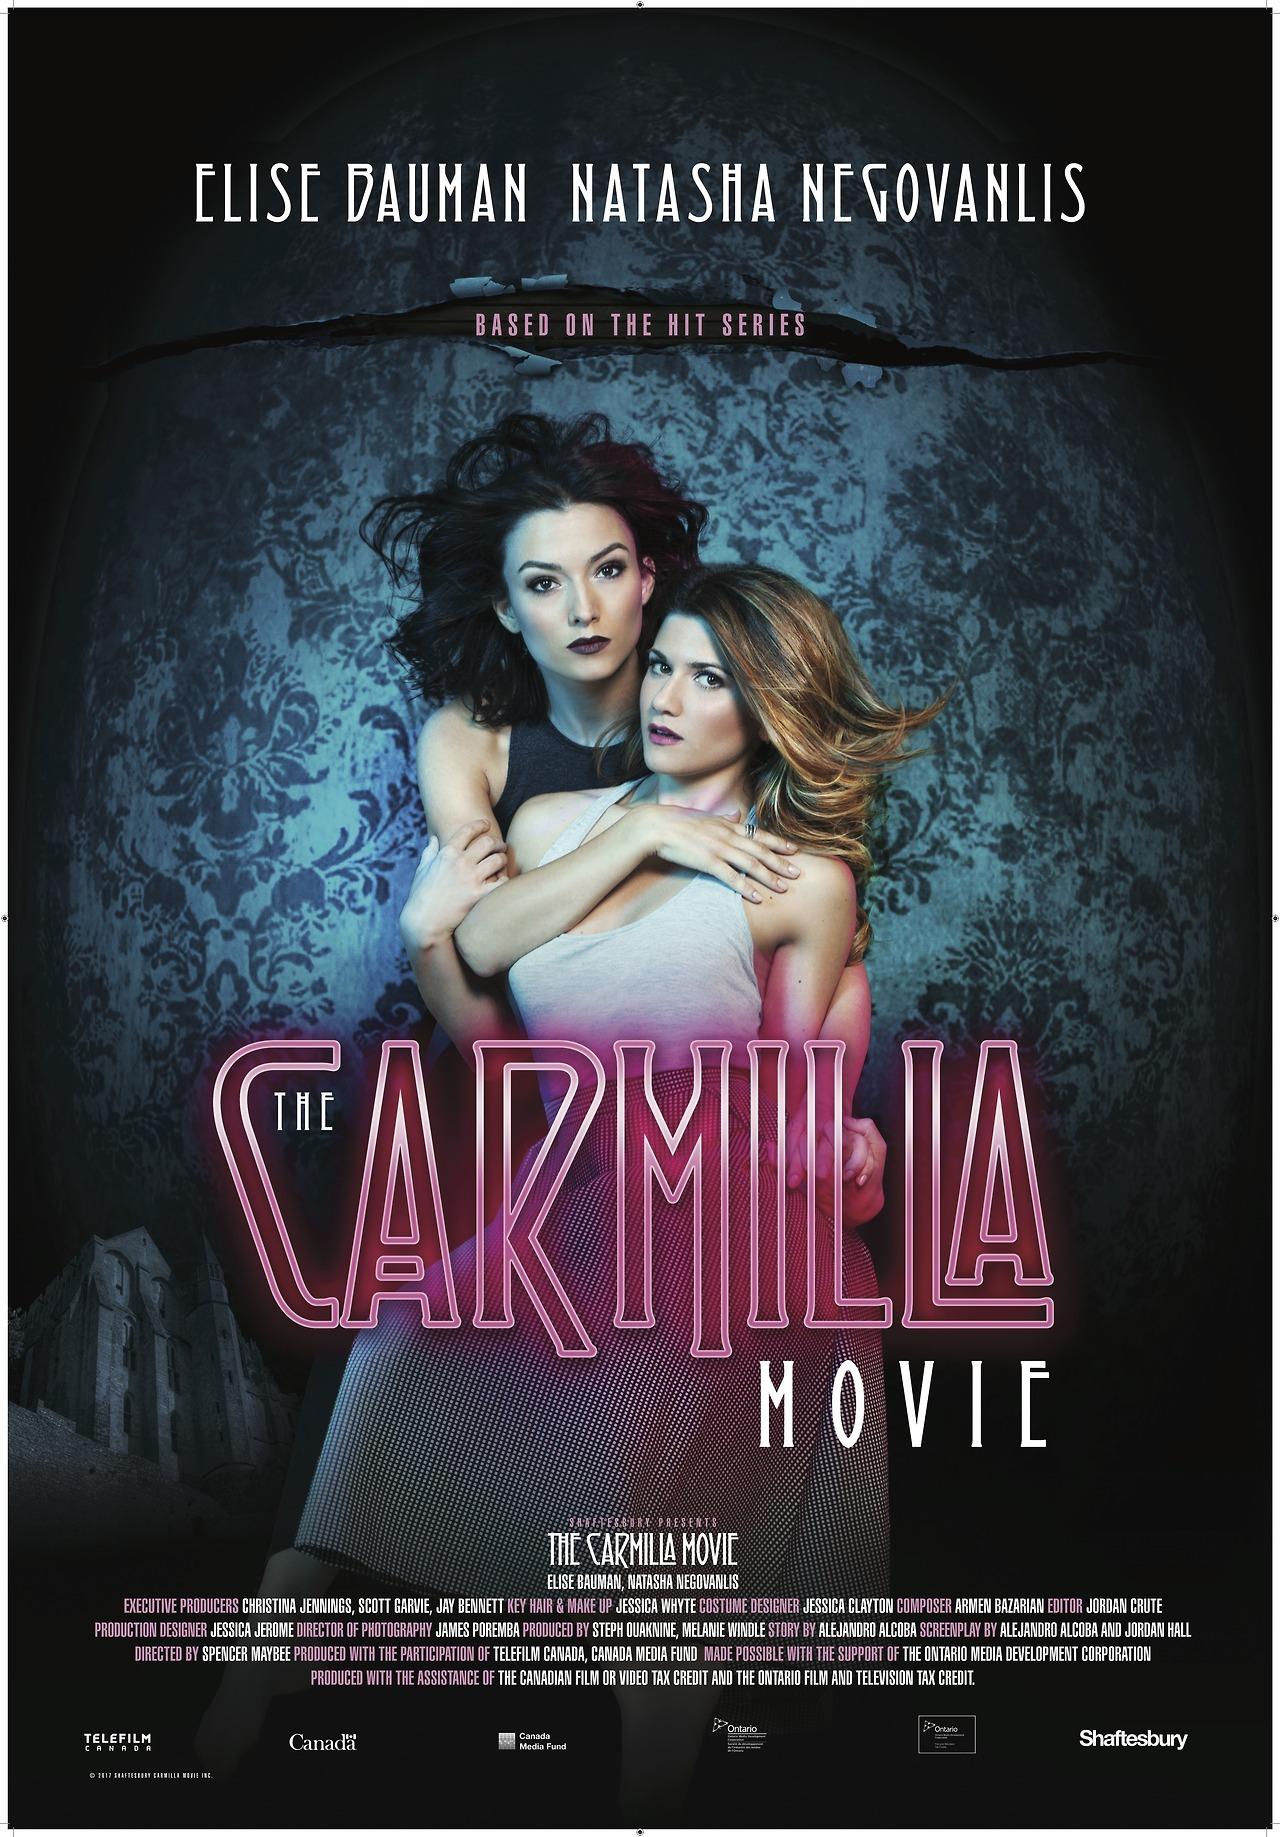 Erotic university movie trailer